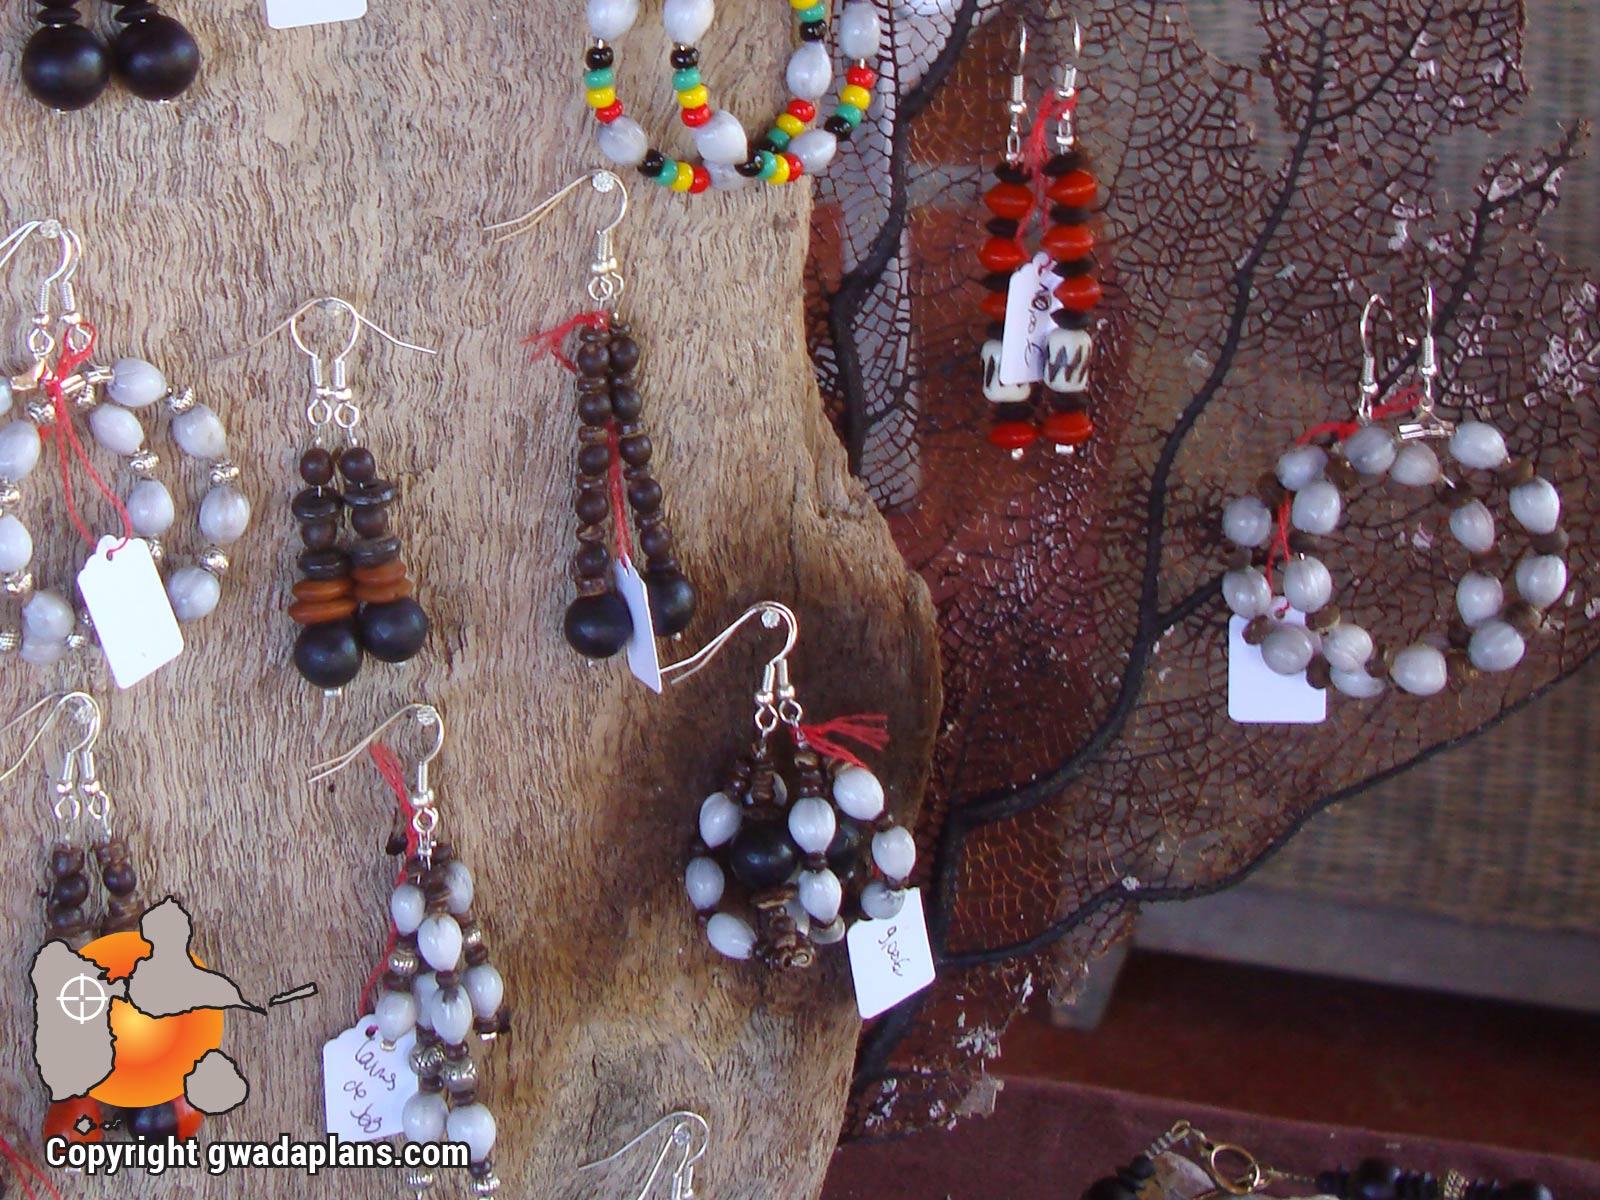 Bijoux en graines - Artisanat de Guadeloupe